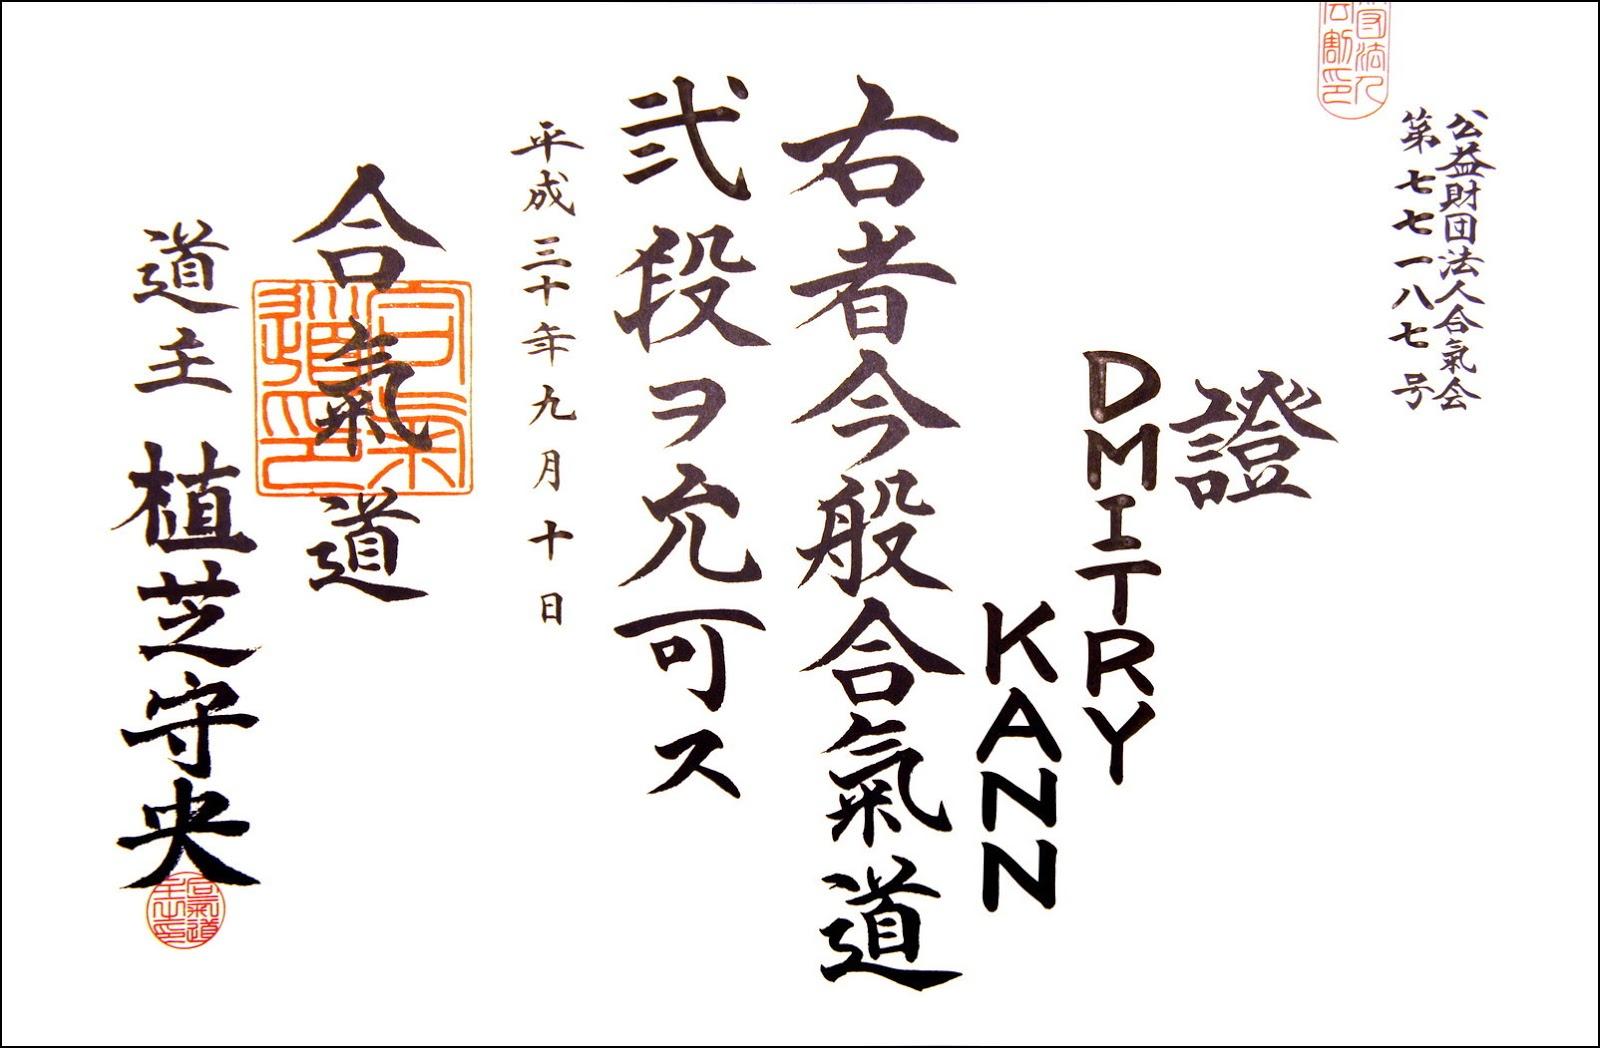 Second dan Aikikai certificate.